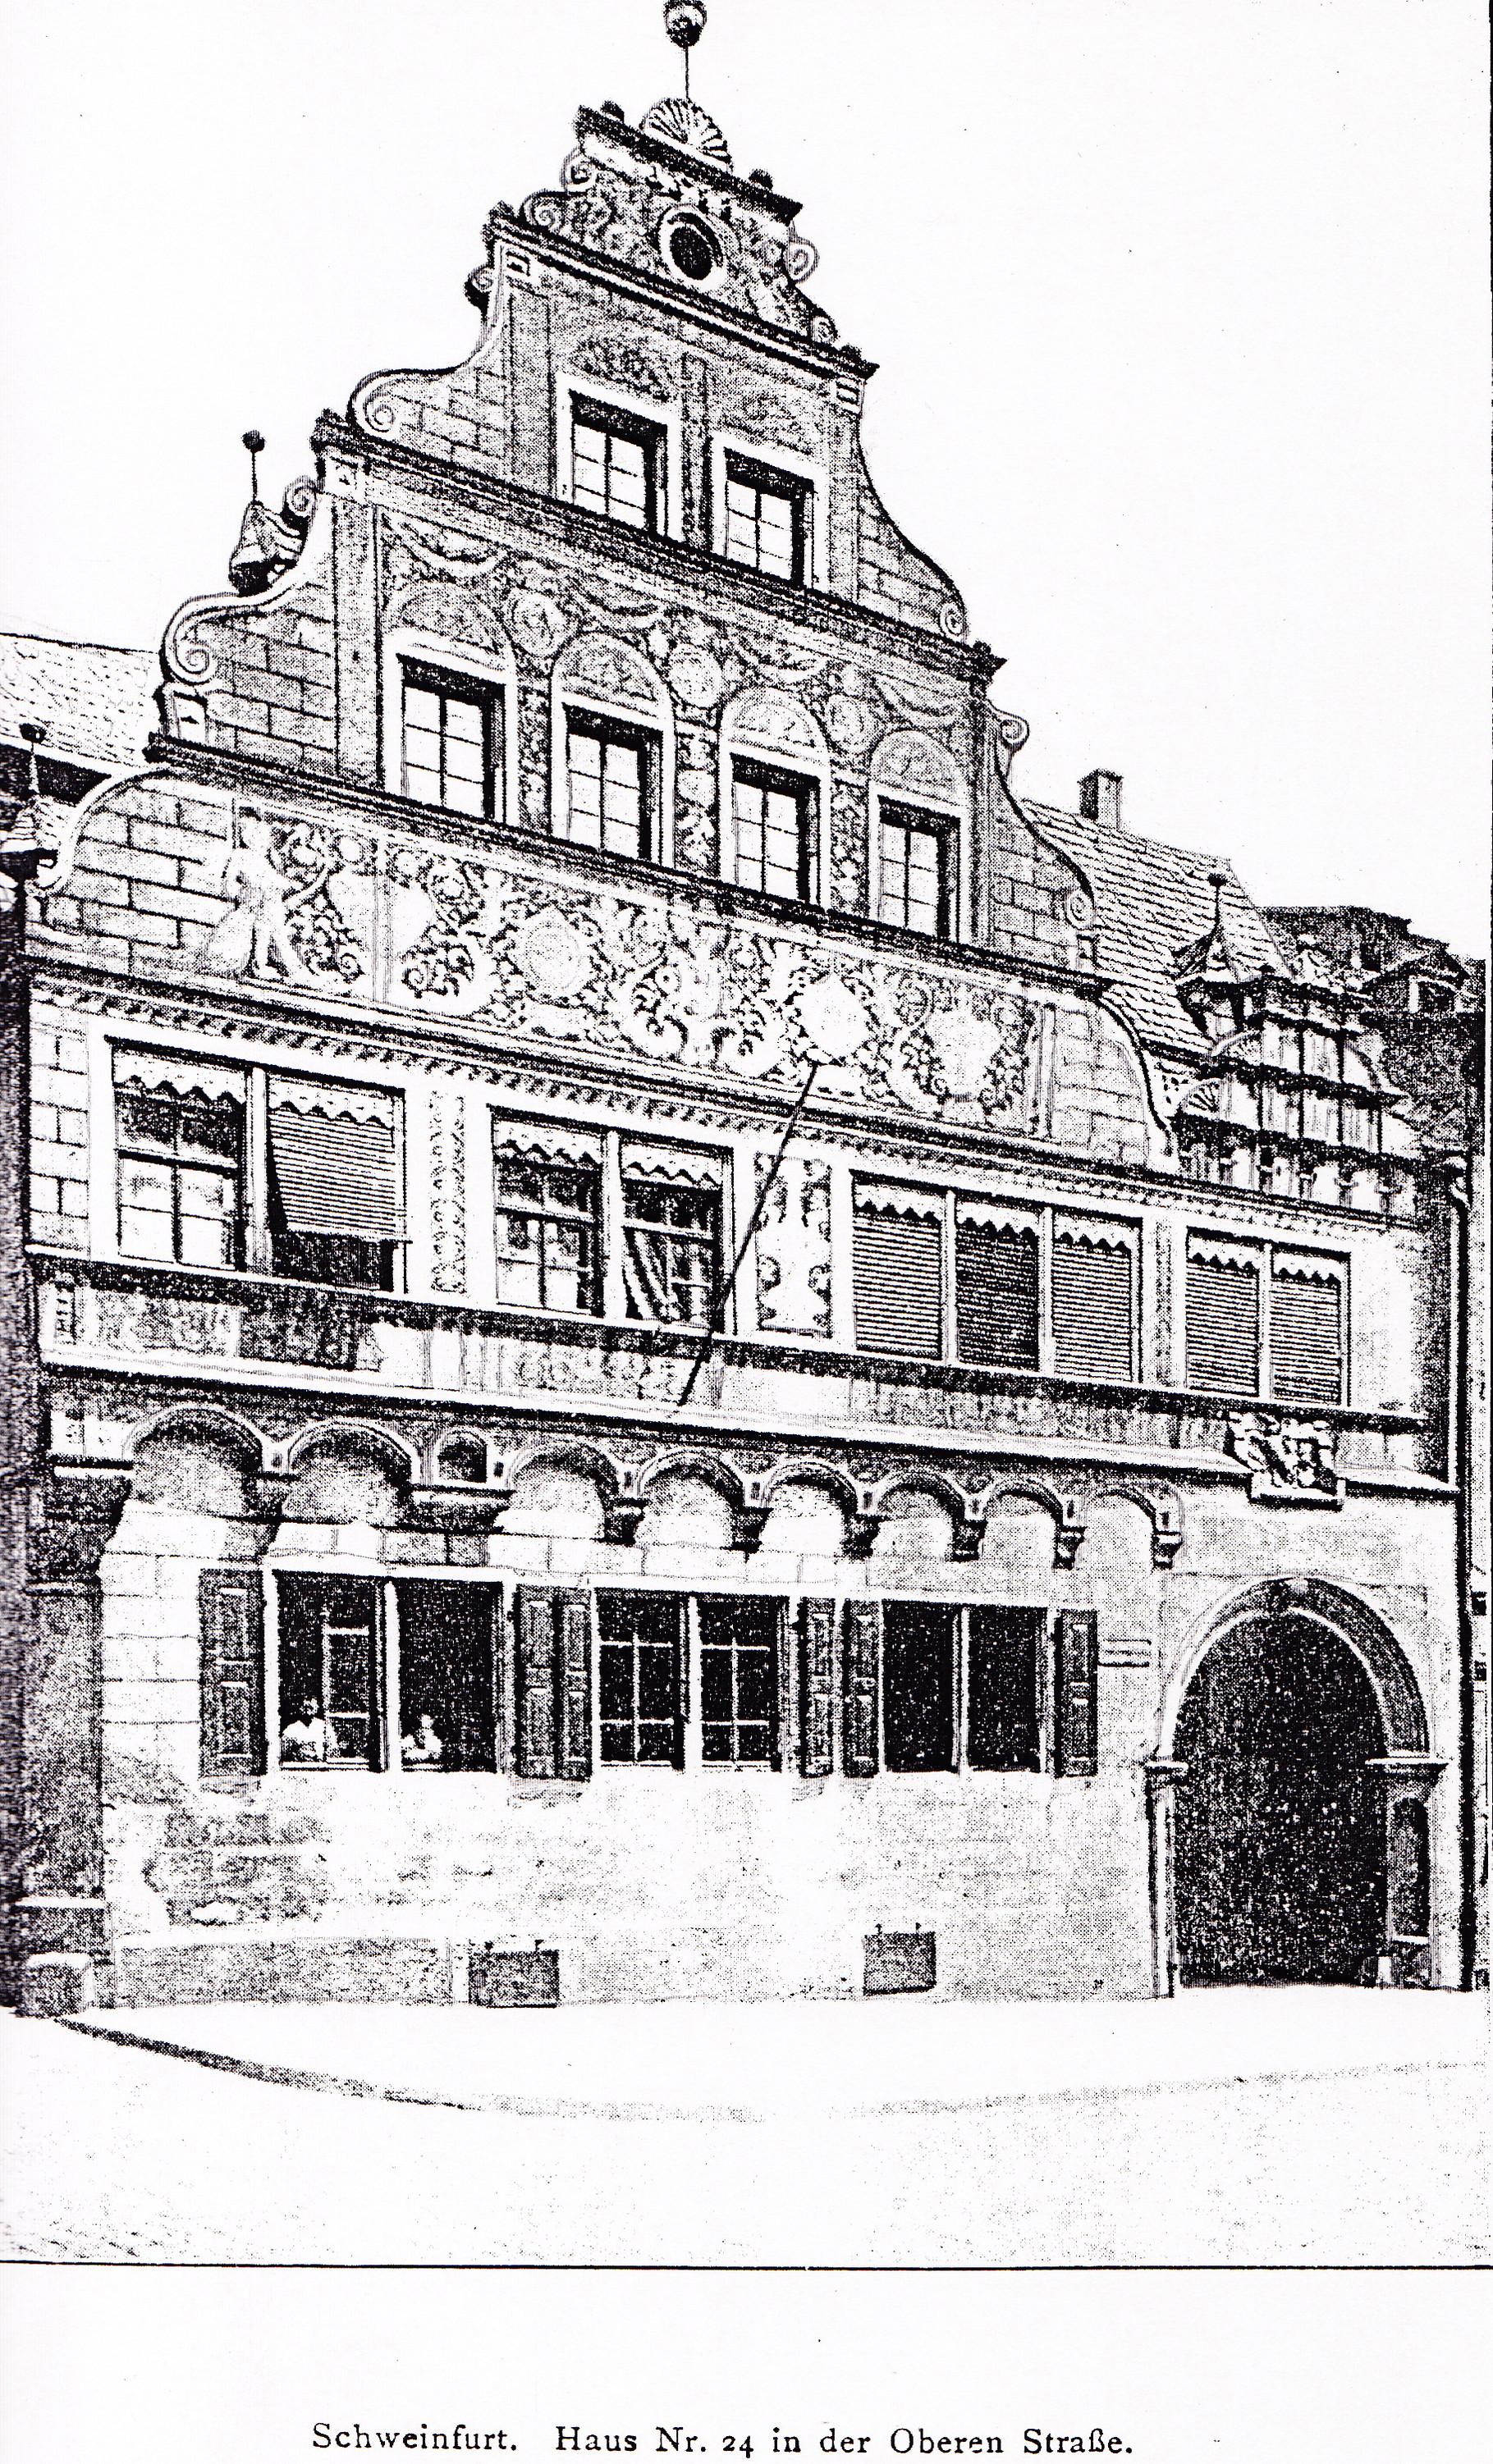 Geschichte des Hauses Obere Straße 24 (Schopperhaus ...